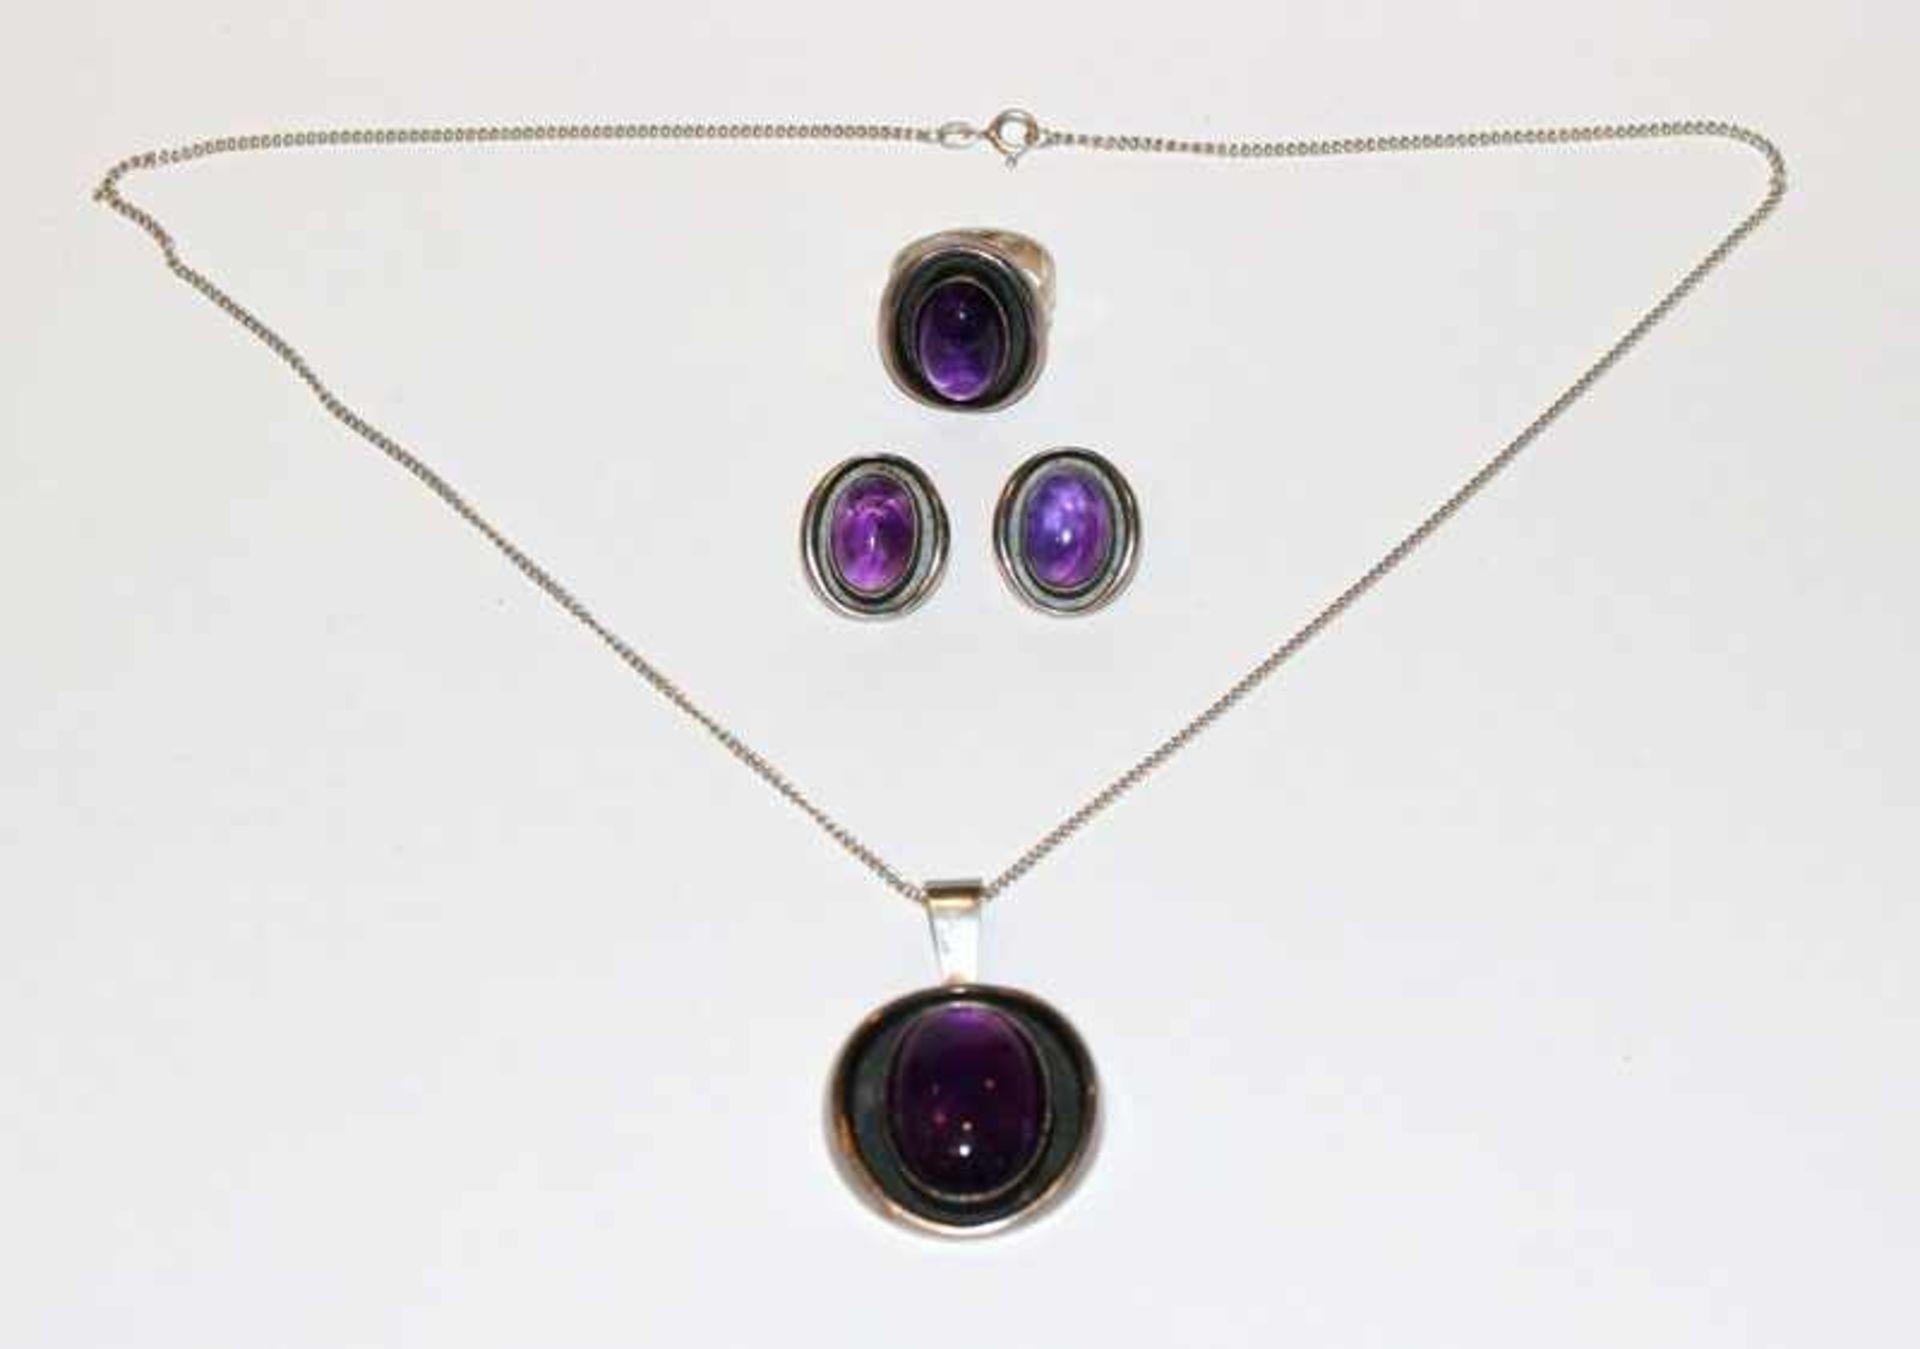 Los 30 - Silber Schmuck-Set mit Amethyst: Paar Ohrclips, Ring, Gr. 54, Anhänger, L 4,5 cm, an Kette, L 48 cm